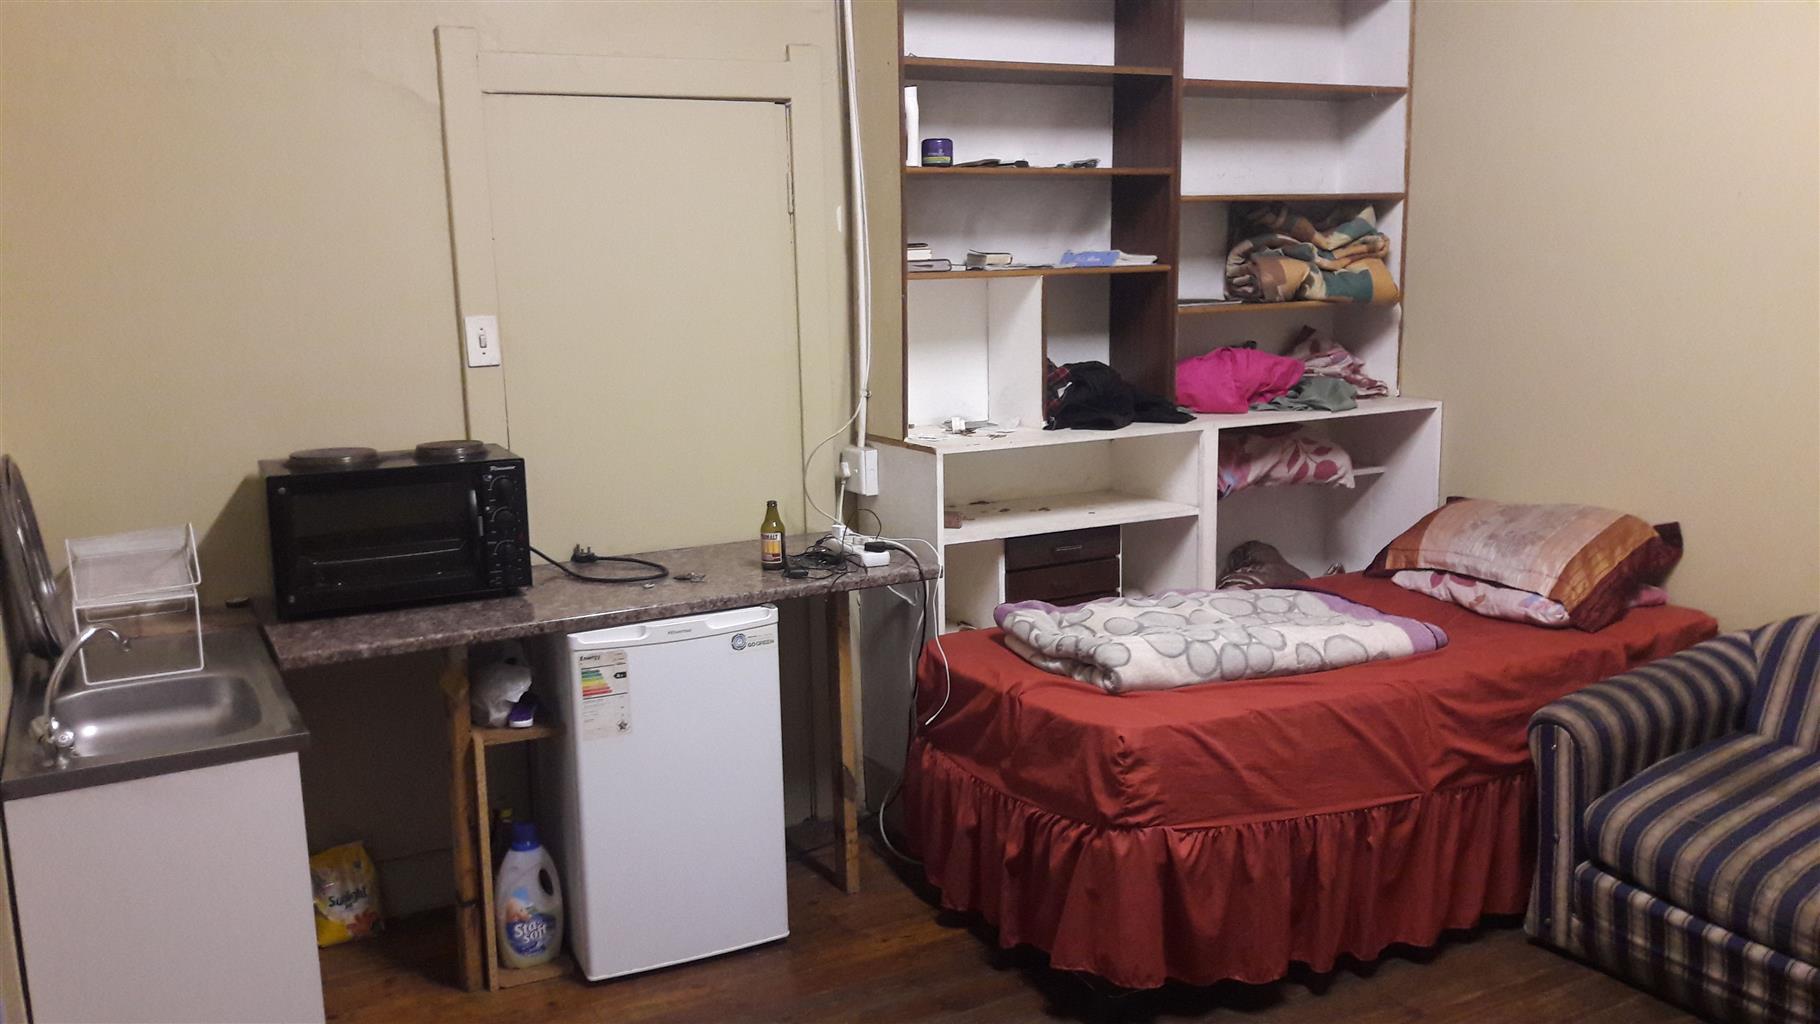 Single Room to Rent in Delville Germiston.